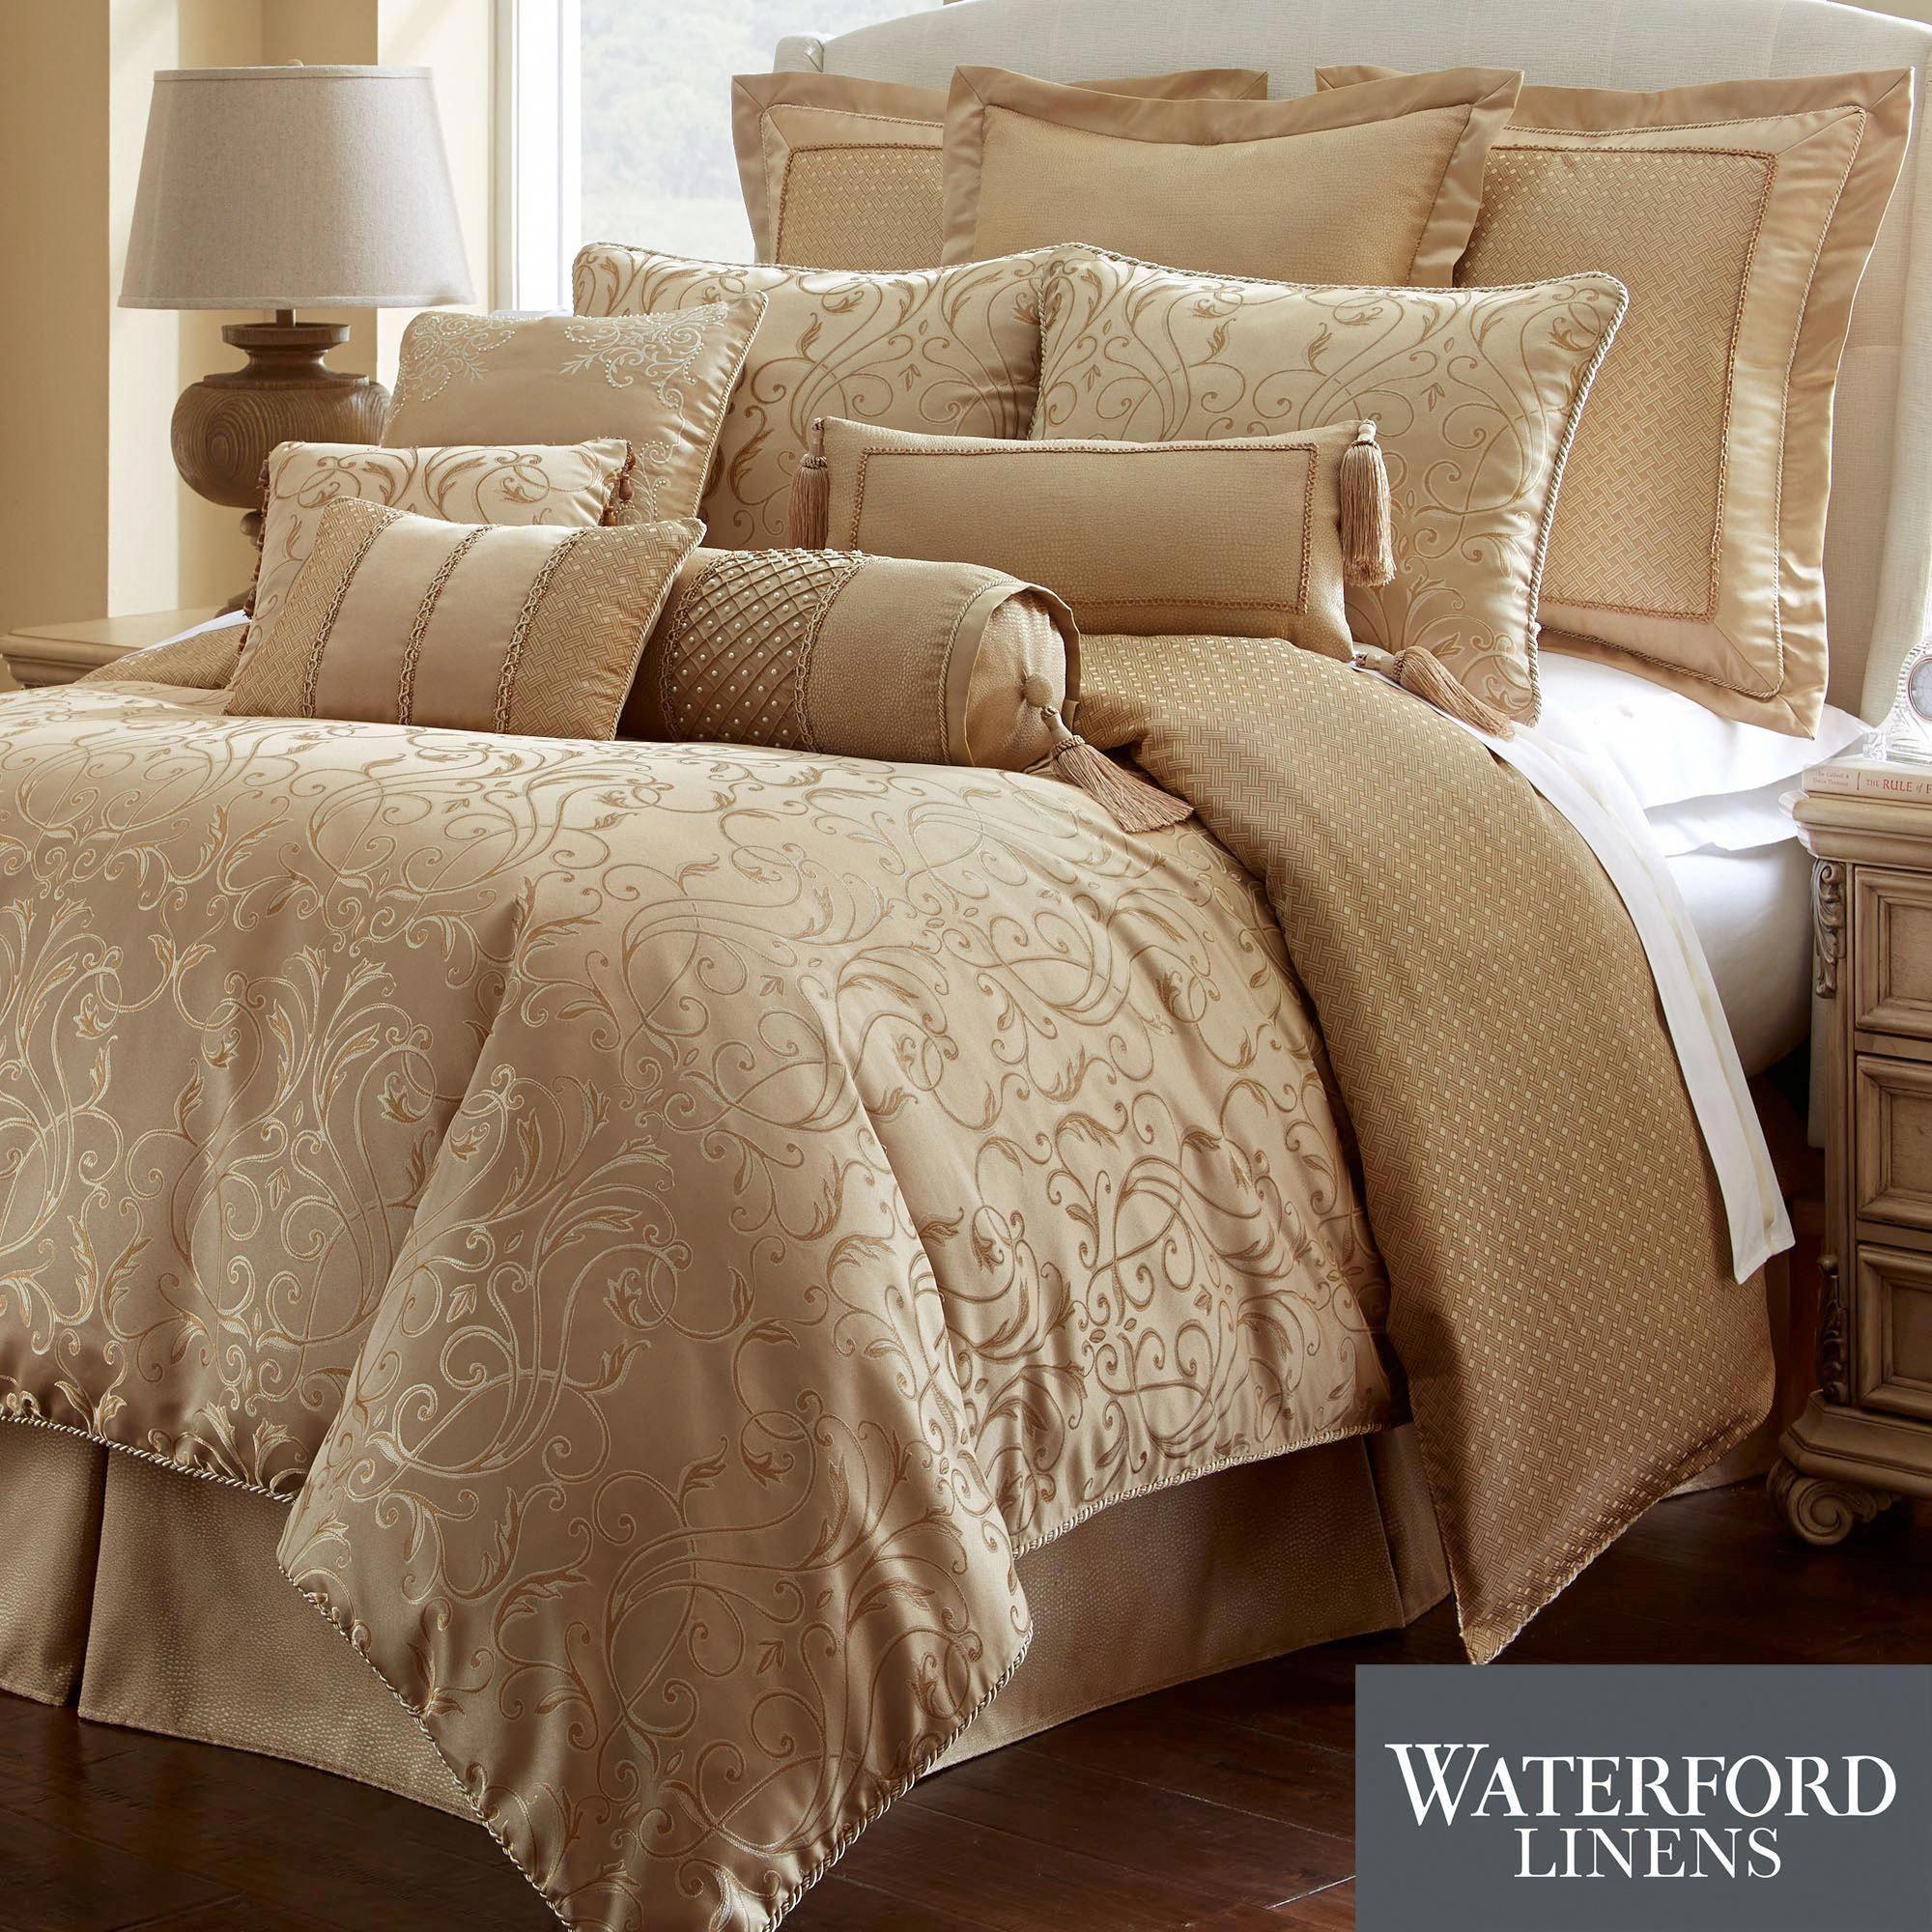 Donating Bed Linen To Charity Impressivebedlinenideas Refferal 4782727868 Bedlinenwalmar Luxury Bedding Master Bedroom Duvet Bedding Sets Cheap Bedding Sets